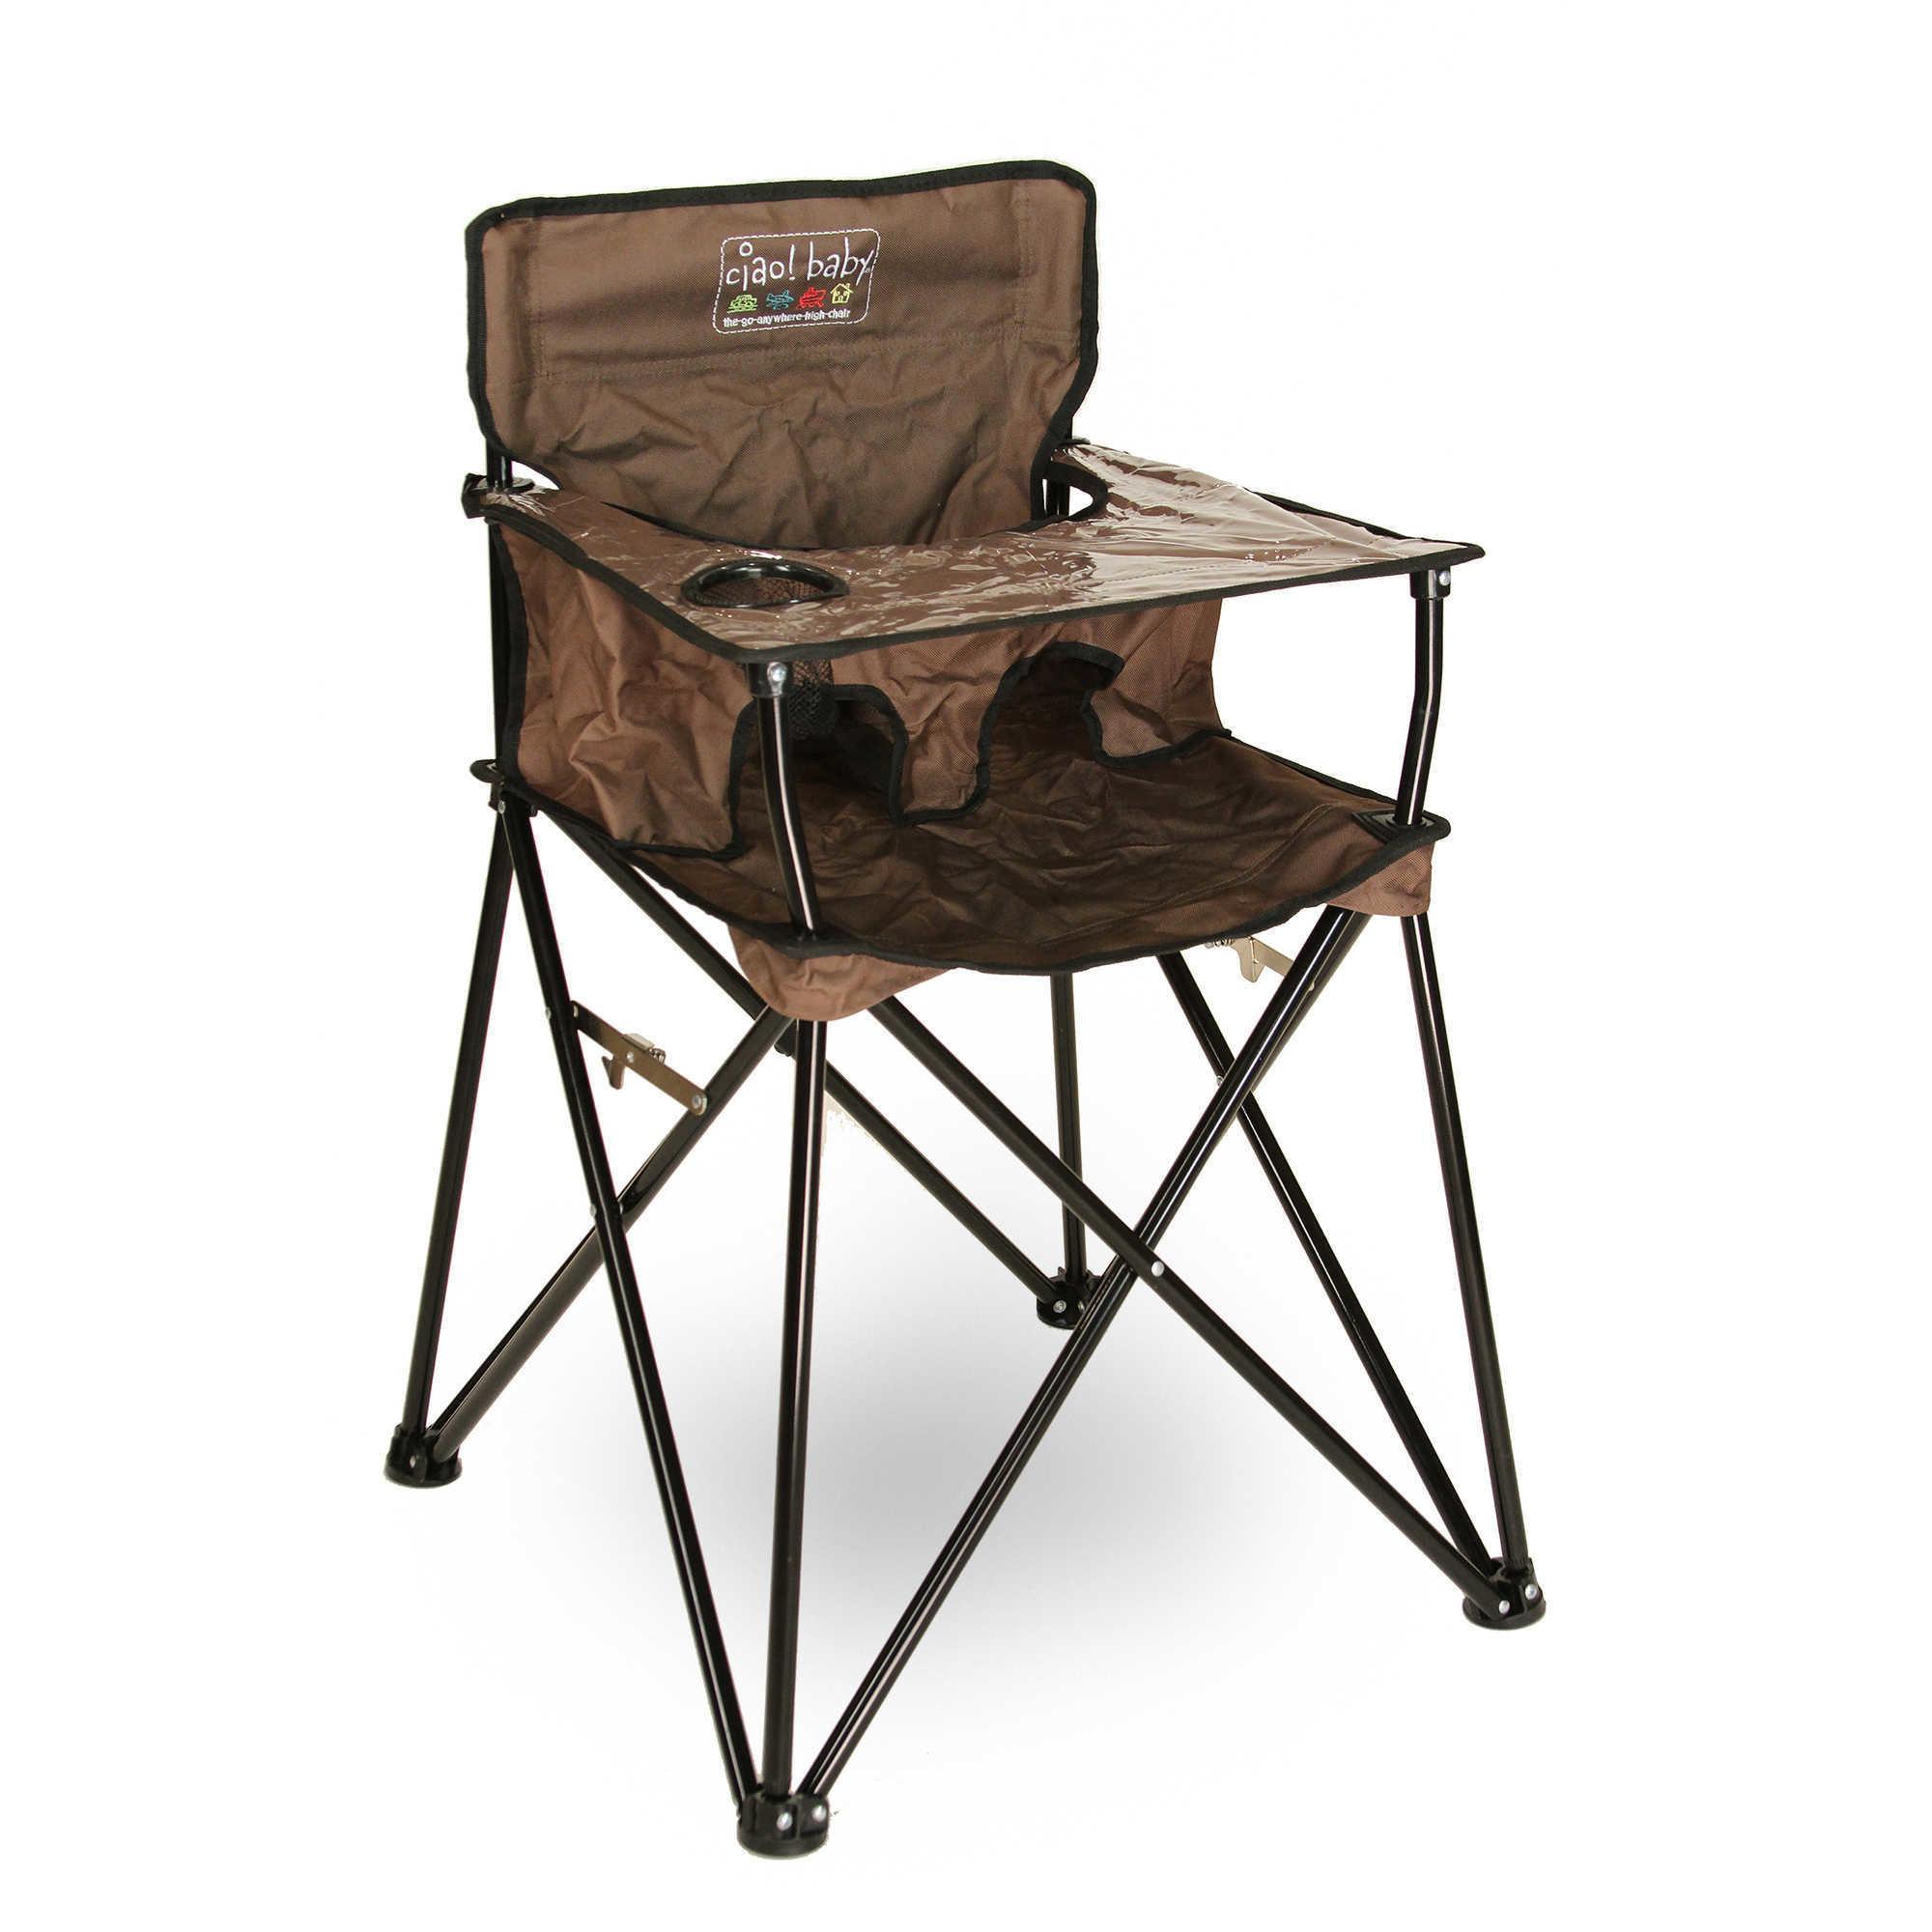 CIAO! Portable Highchair